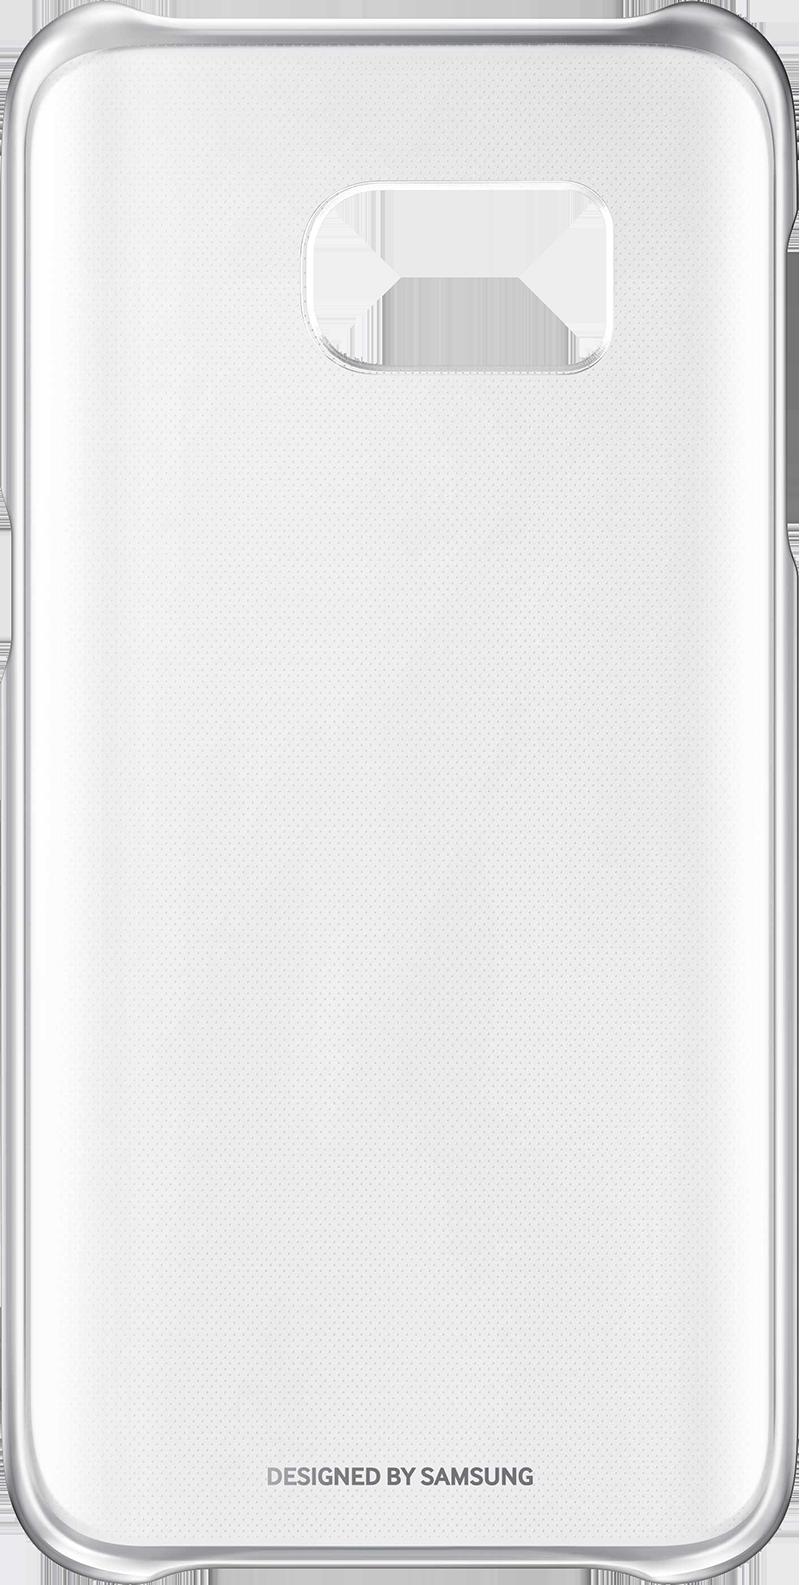 Coque transparente Samsung Galaxy S7 EDGE Argent